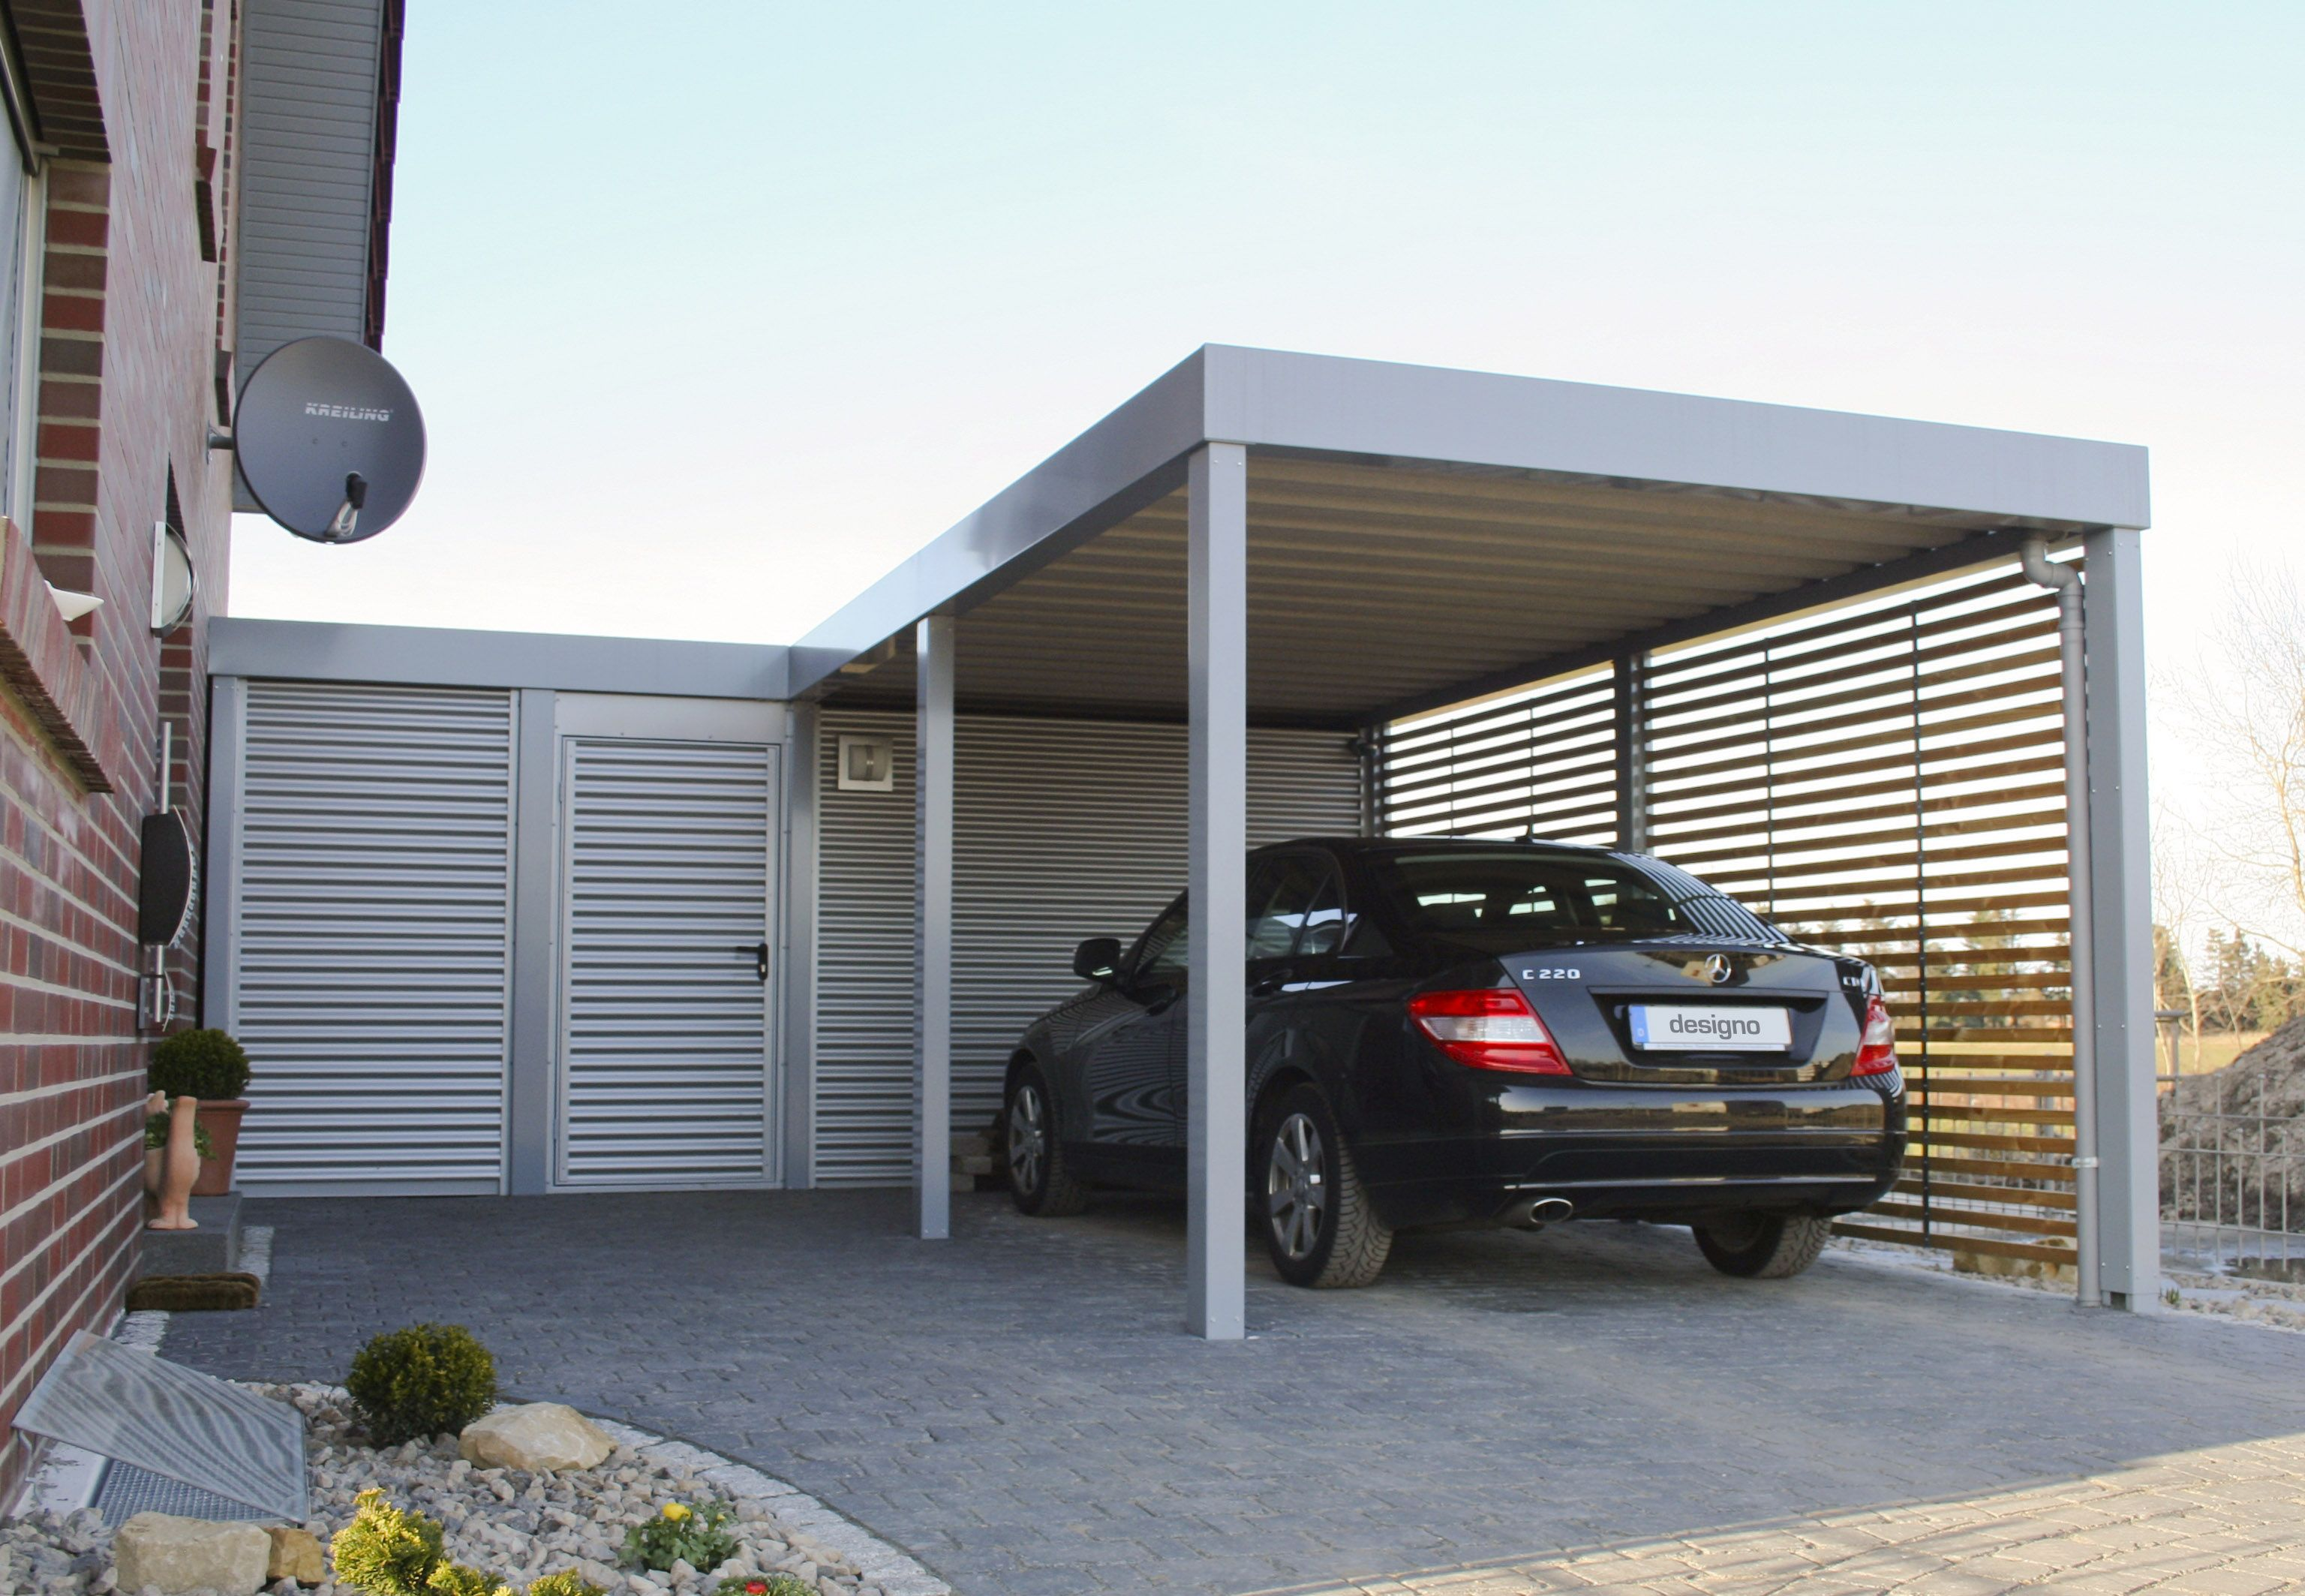 carport carport selbst bauen carport pinterest garage carport designs and carport garage. Black Bedroom Furniture Sets. Home Design Ideas